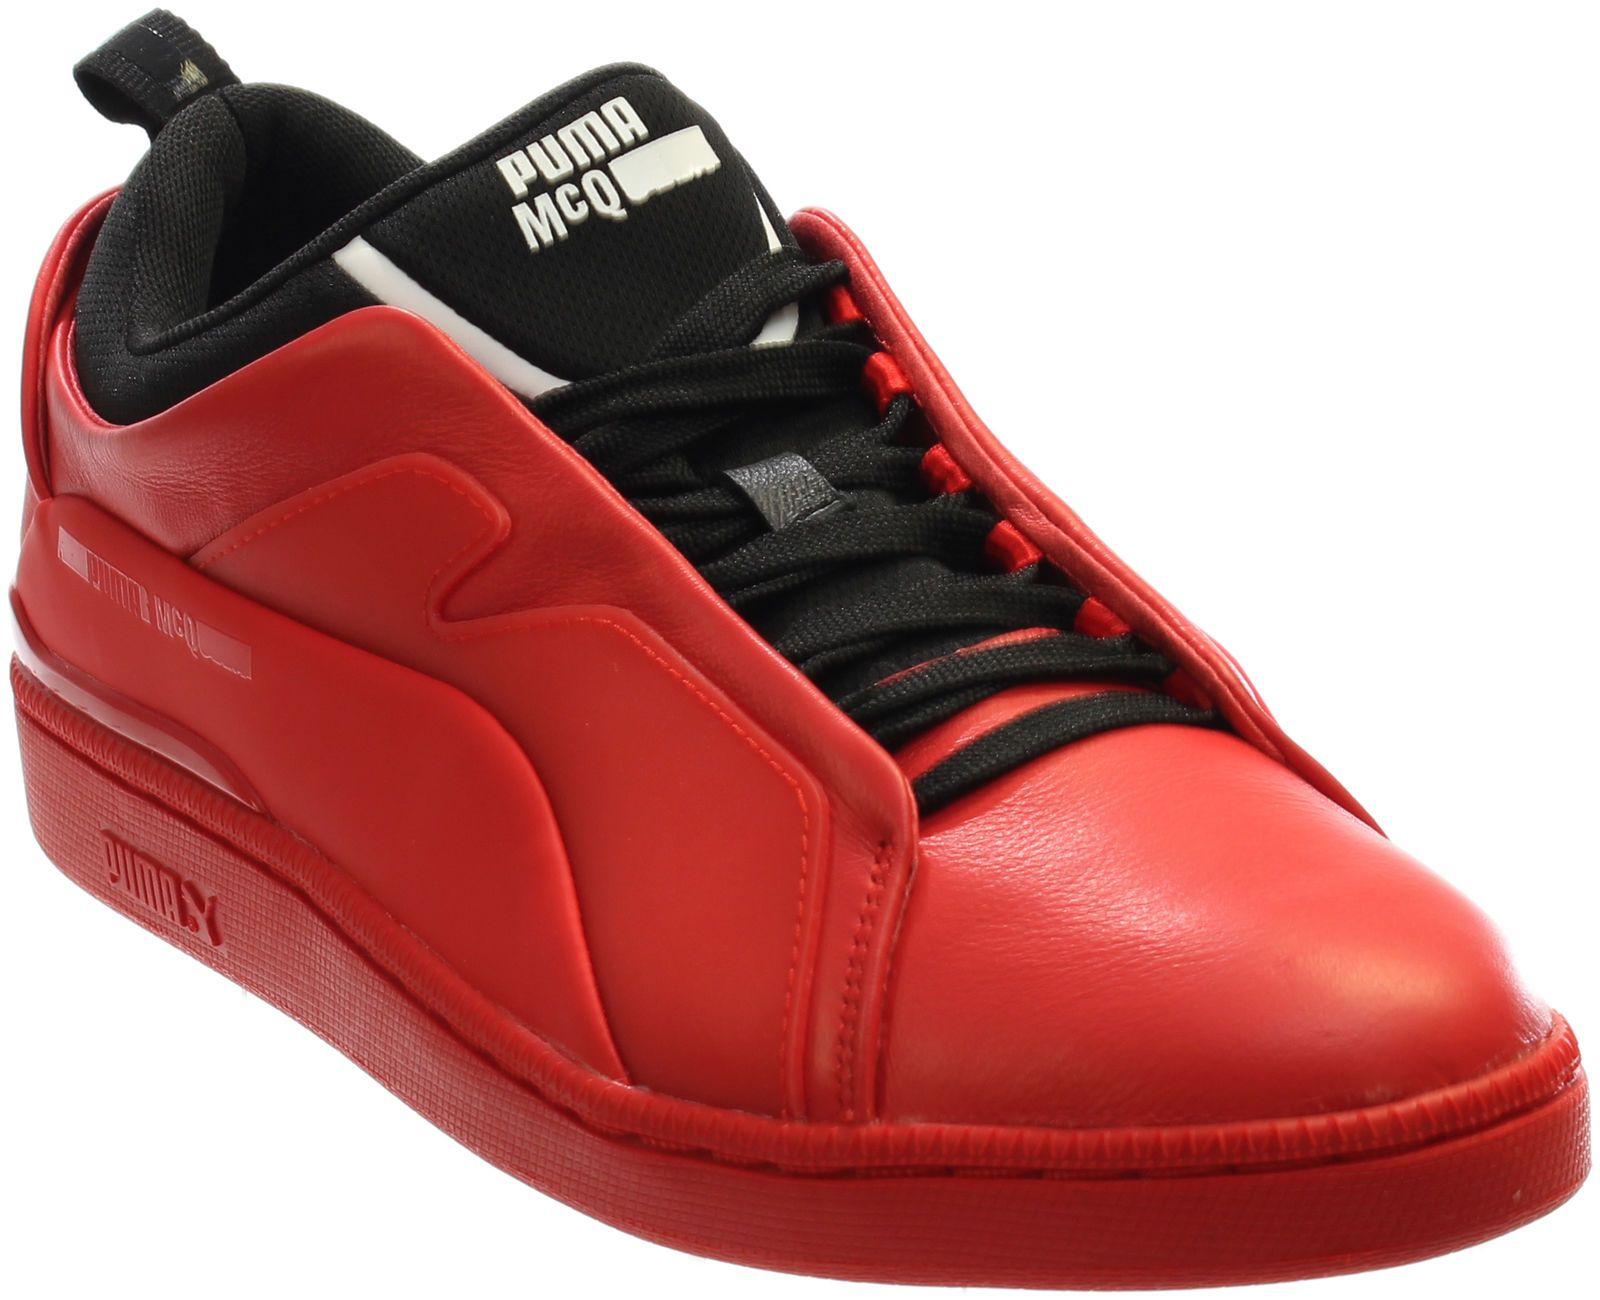 Puma Alexander McQueen Brace Low Sneakers Red Mens